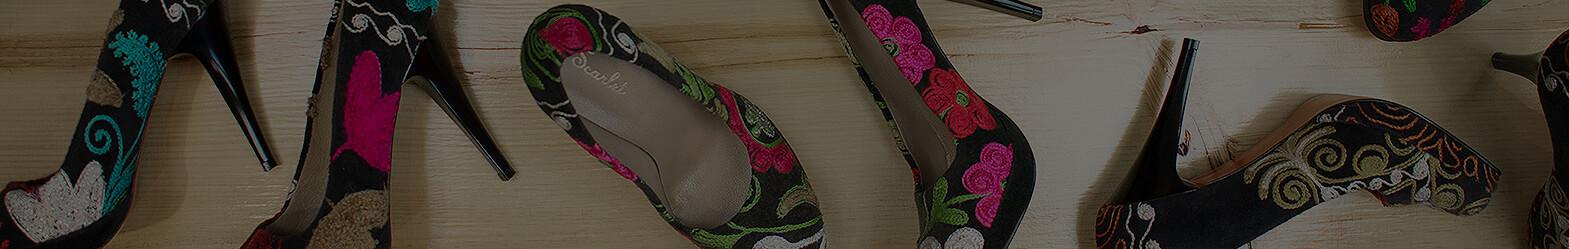 Suzani Shoes